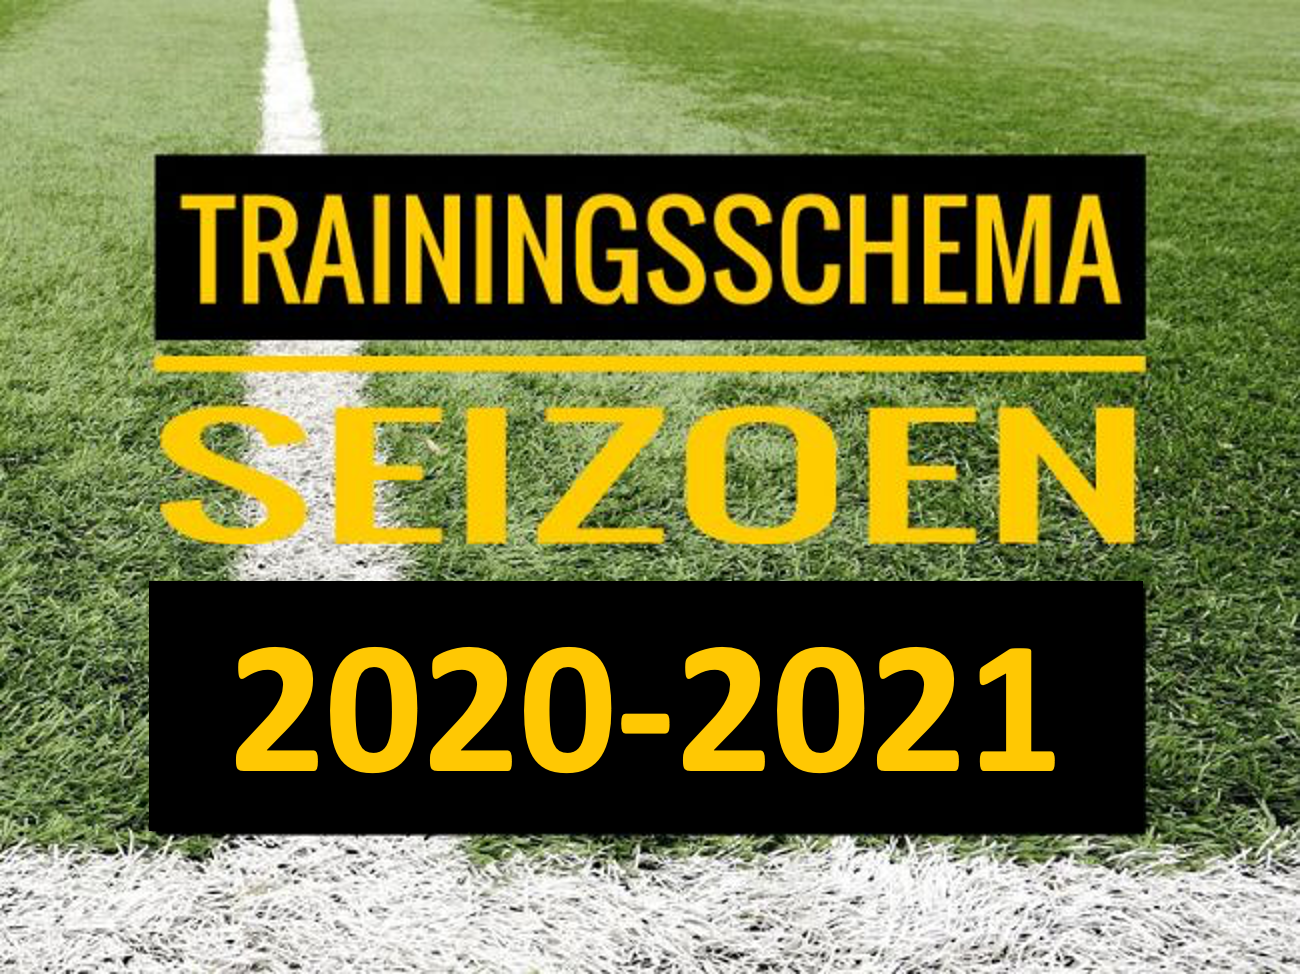 (Concept) Trainingsschema volgend seizoen bekend